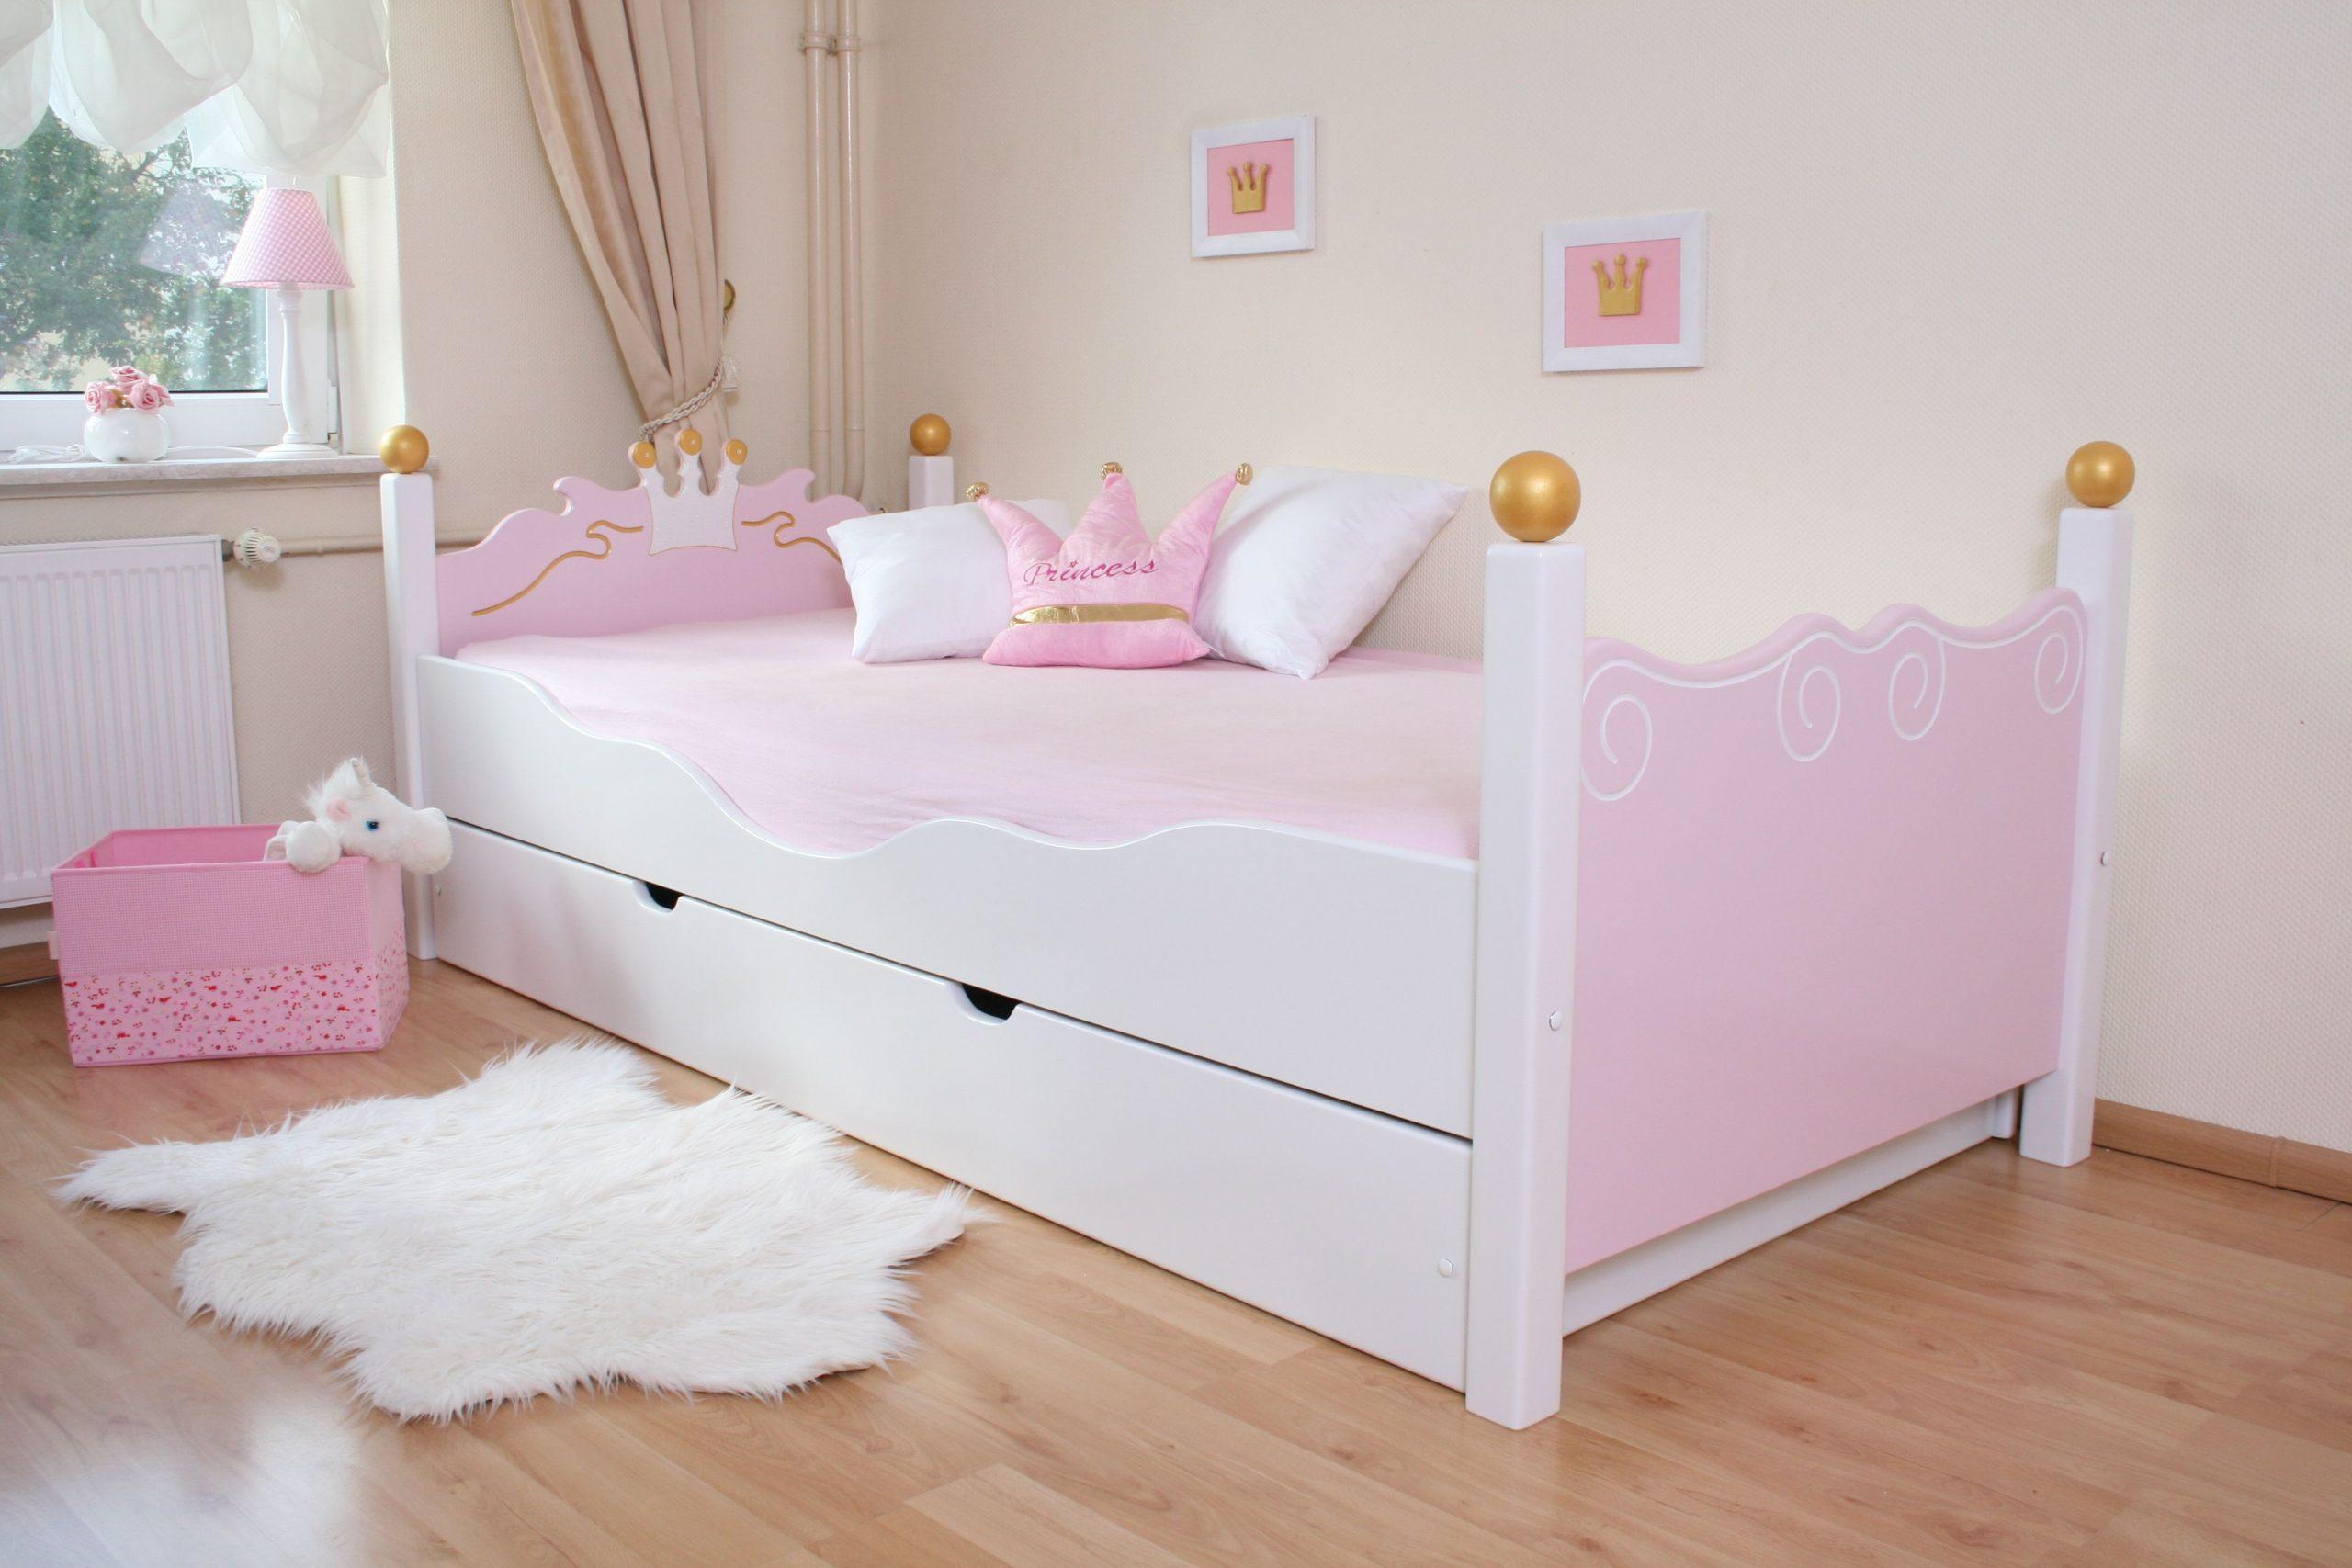 Full Size of Kinderbett Mädchen Fr Mdchen Oliniki Bett Betten Wohnzimmer Kinderbett Mädchen